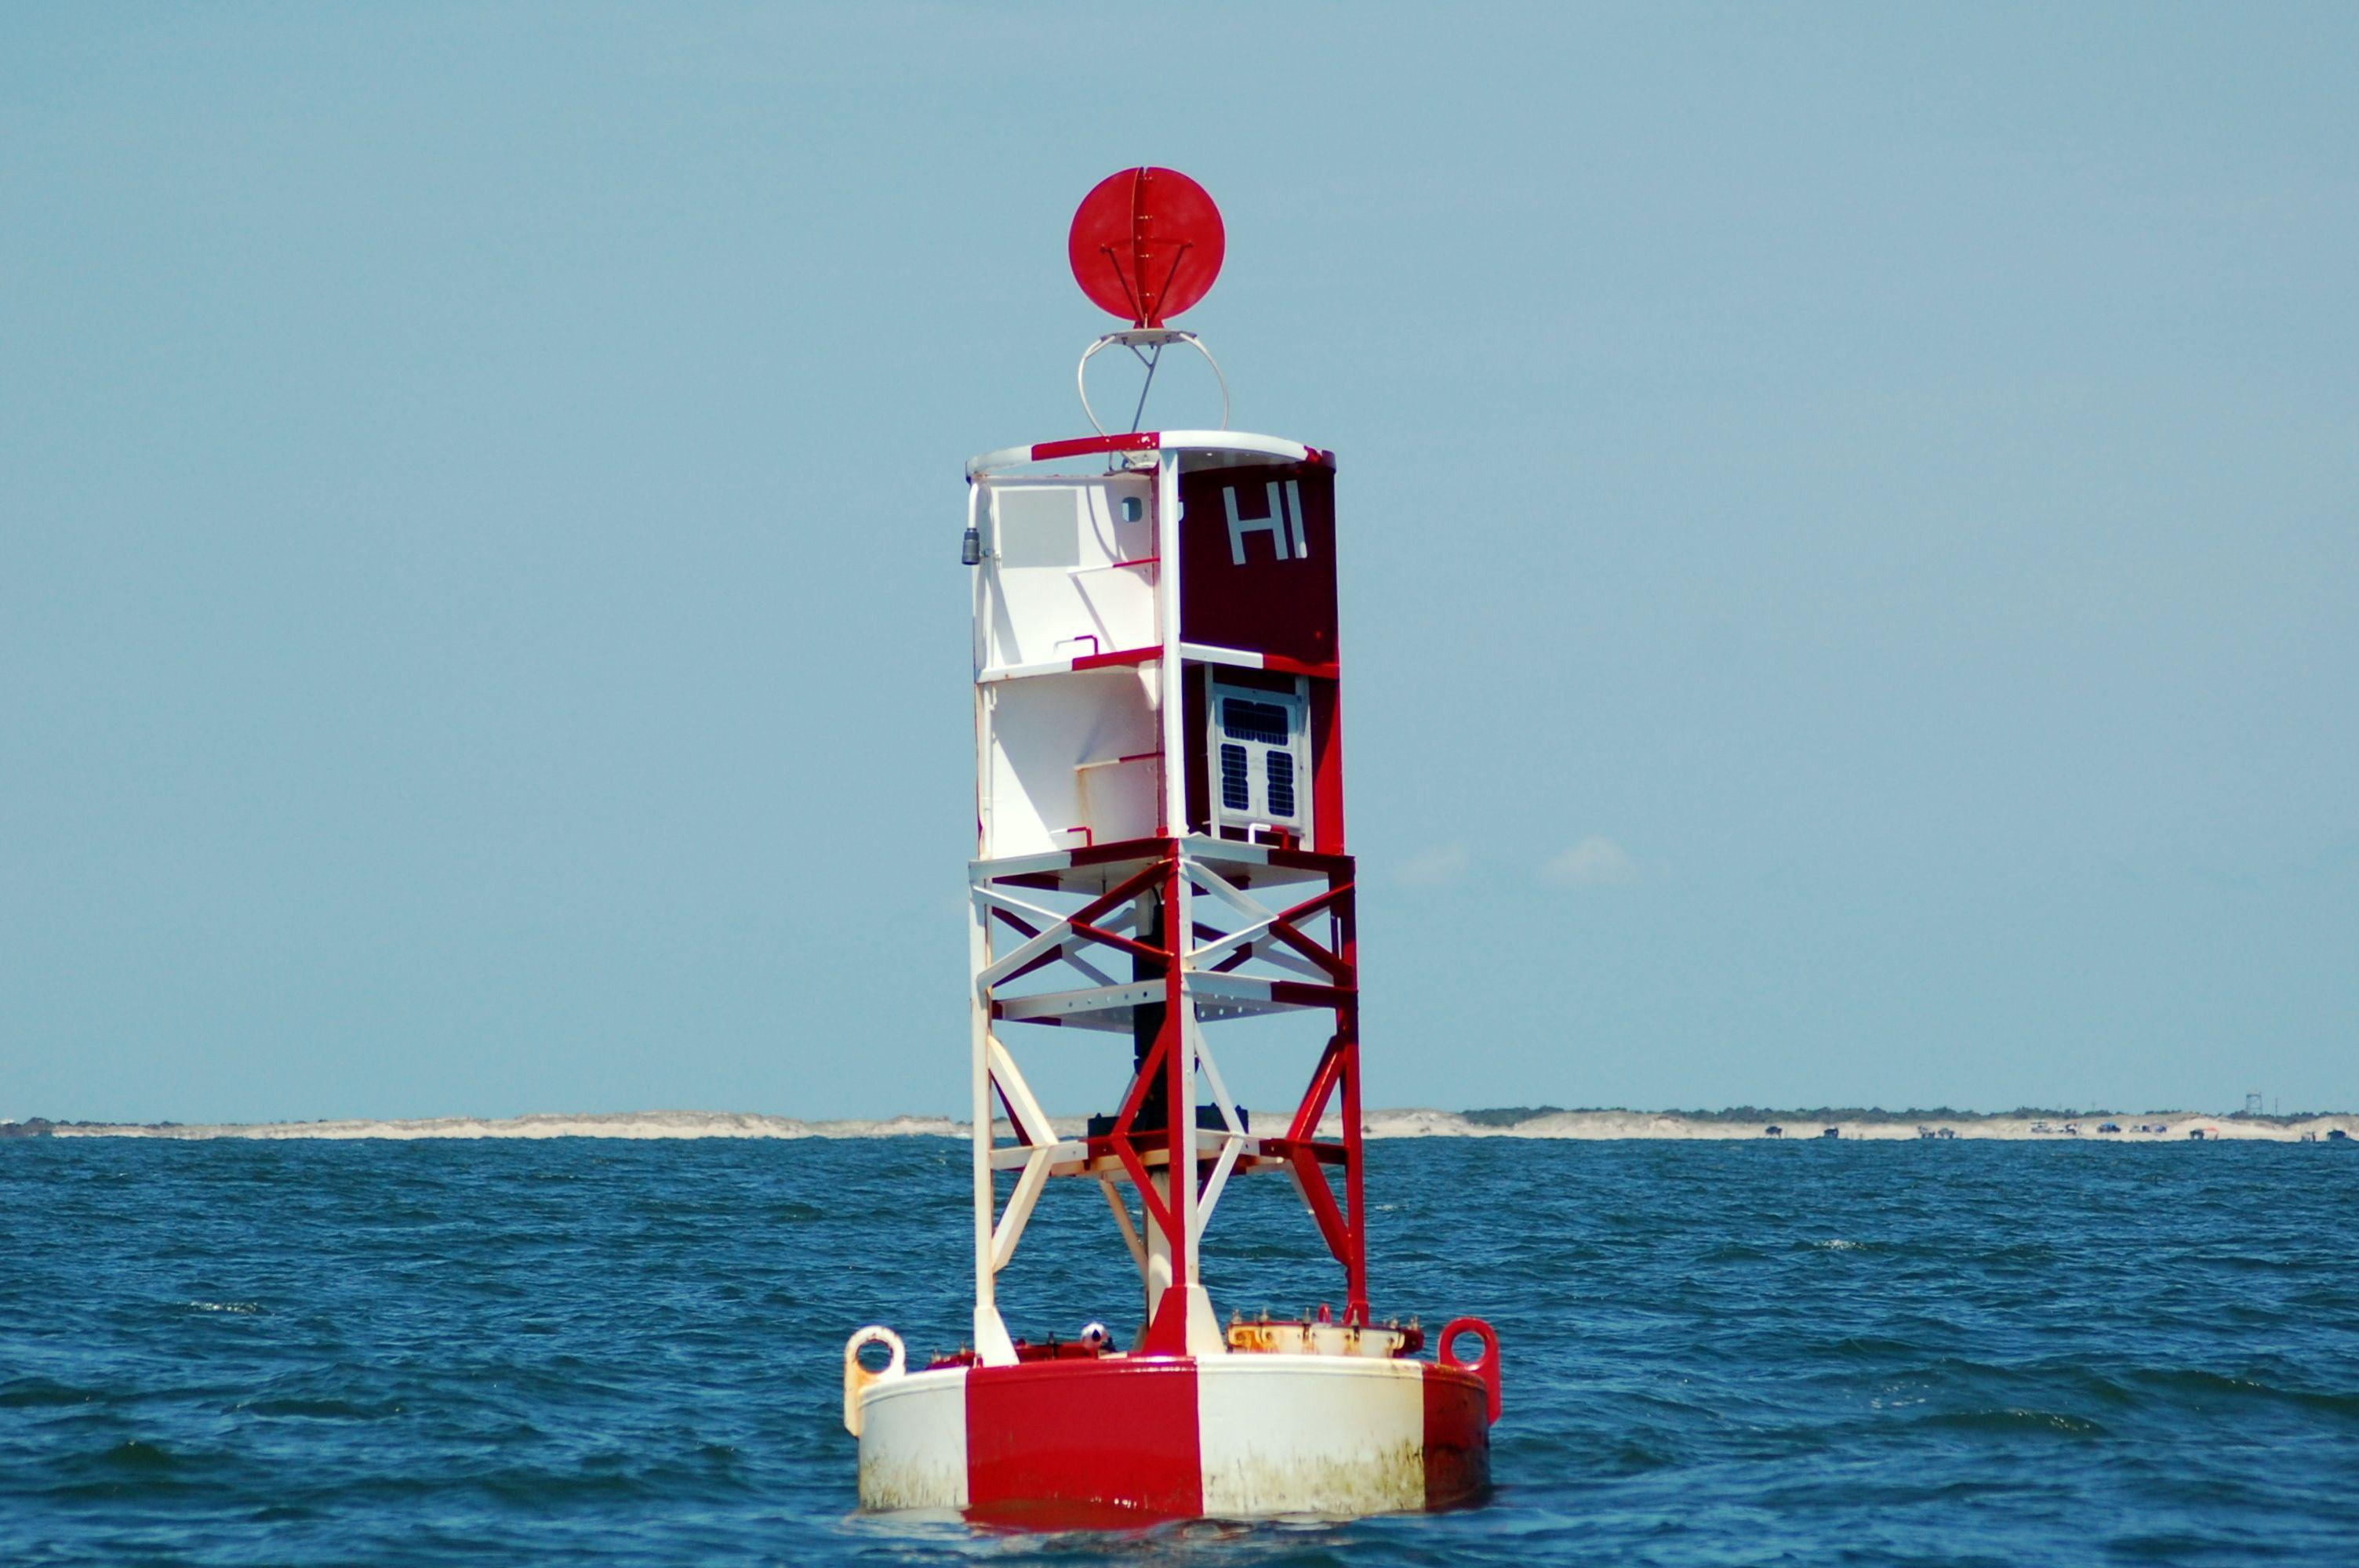 cape hatteras buoy obx [ 3008 x 2000 Pixel ]